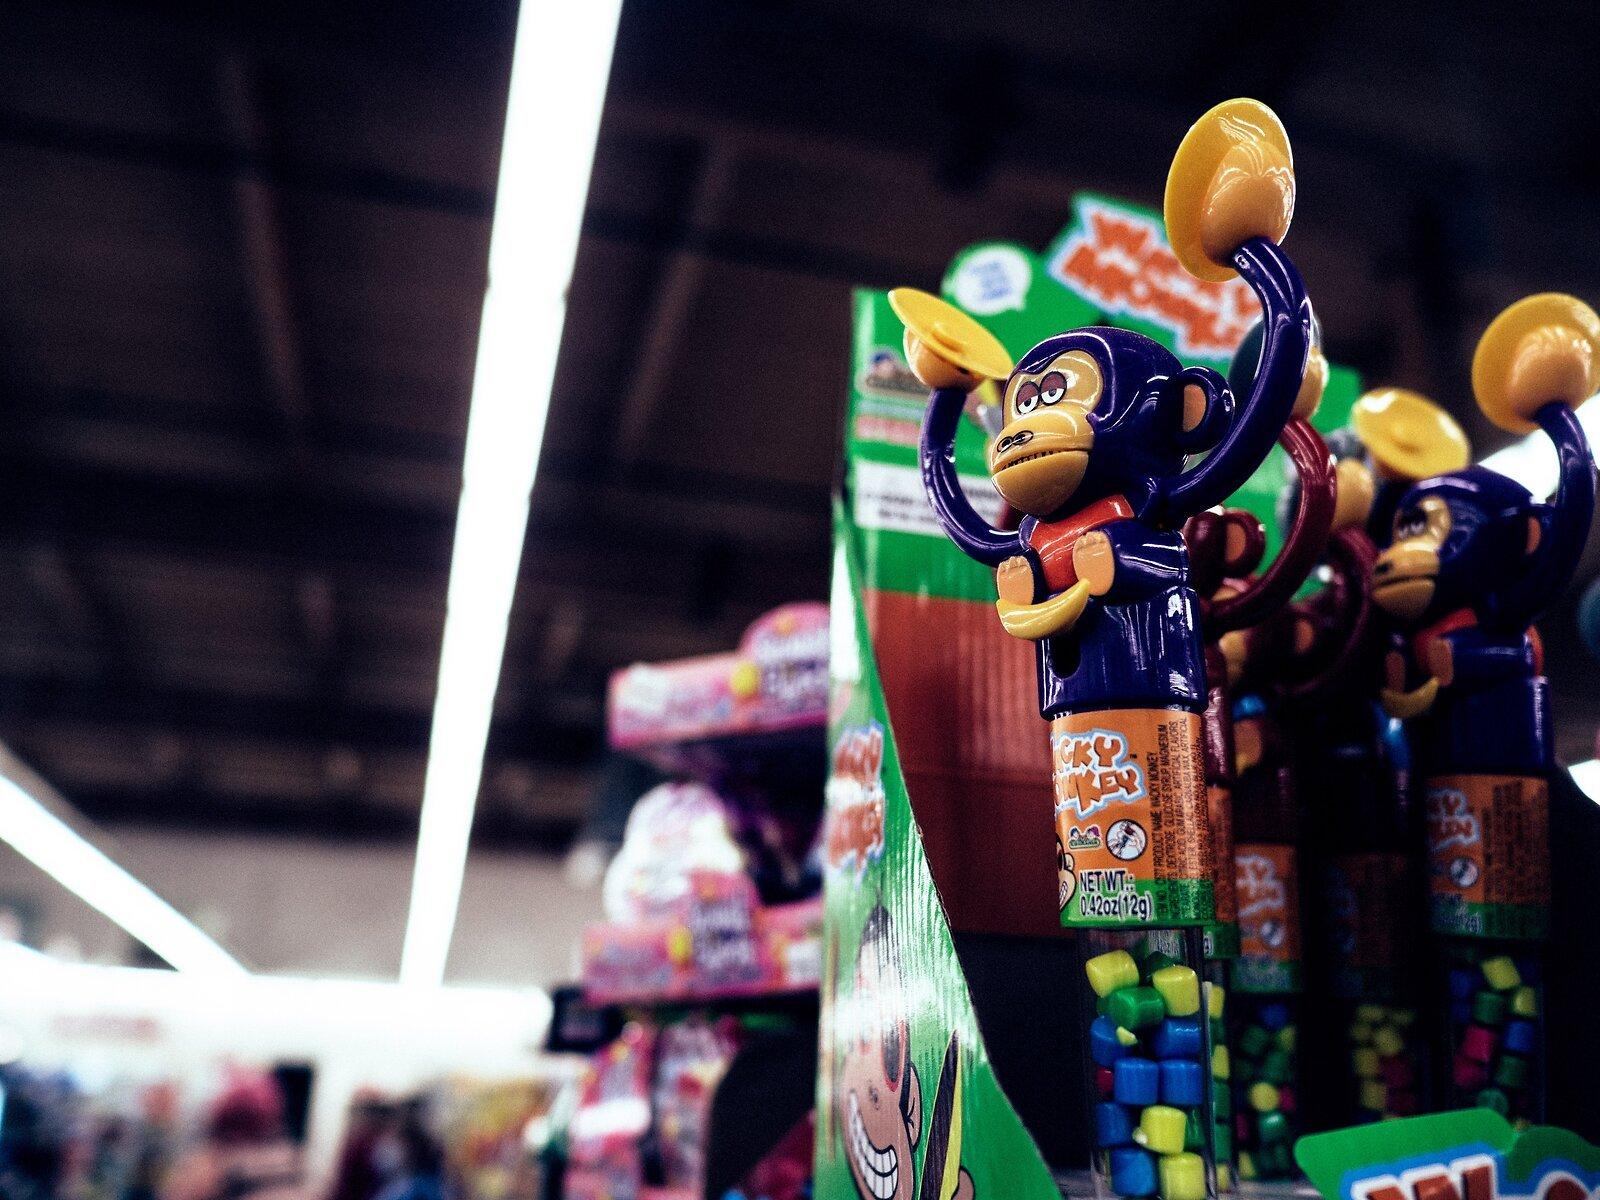 GX9_Jun21_21_Supermarket_Tricky_Monkey(VSCOportra).jpg